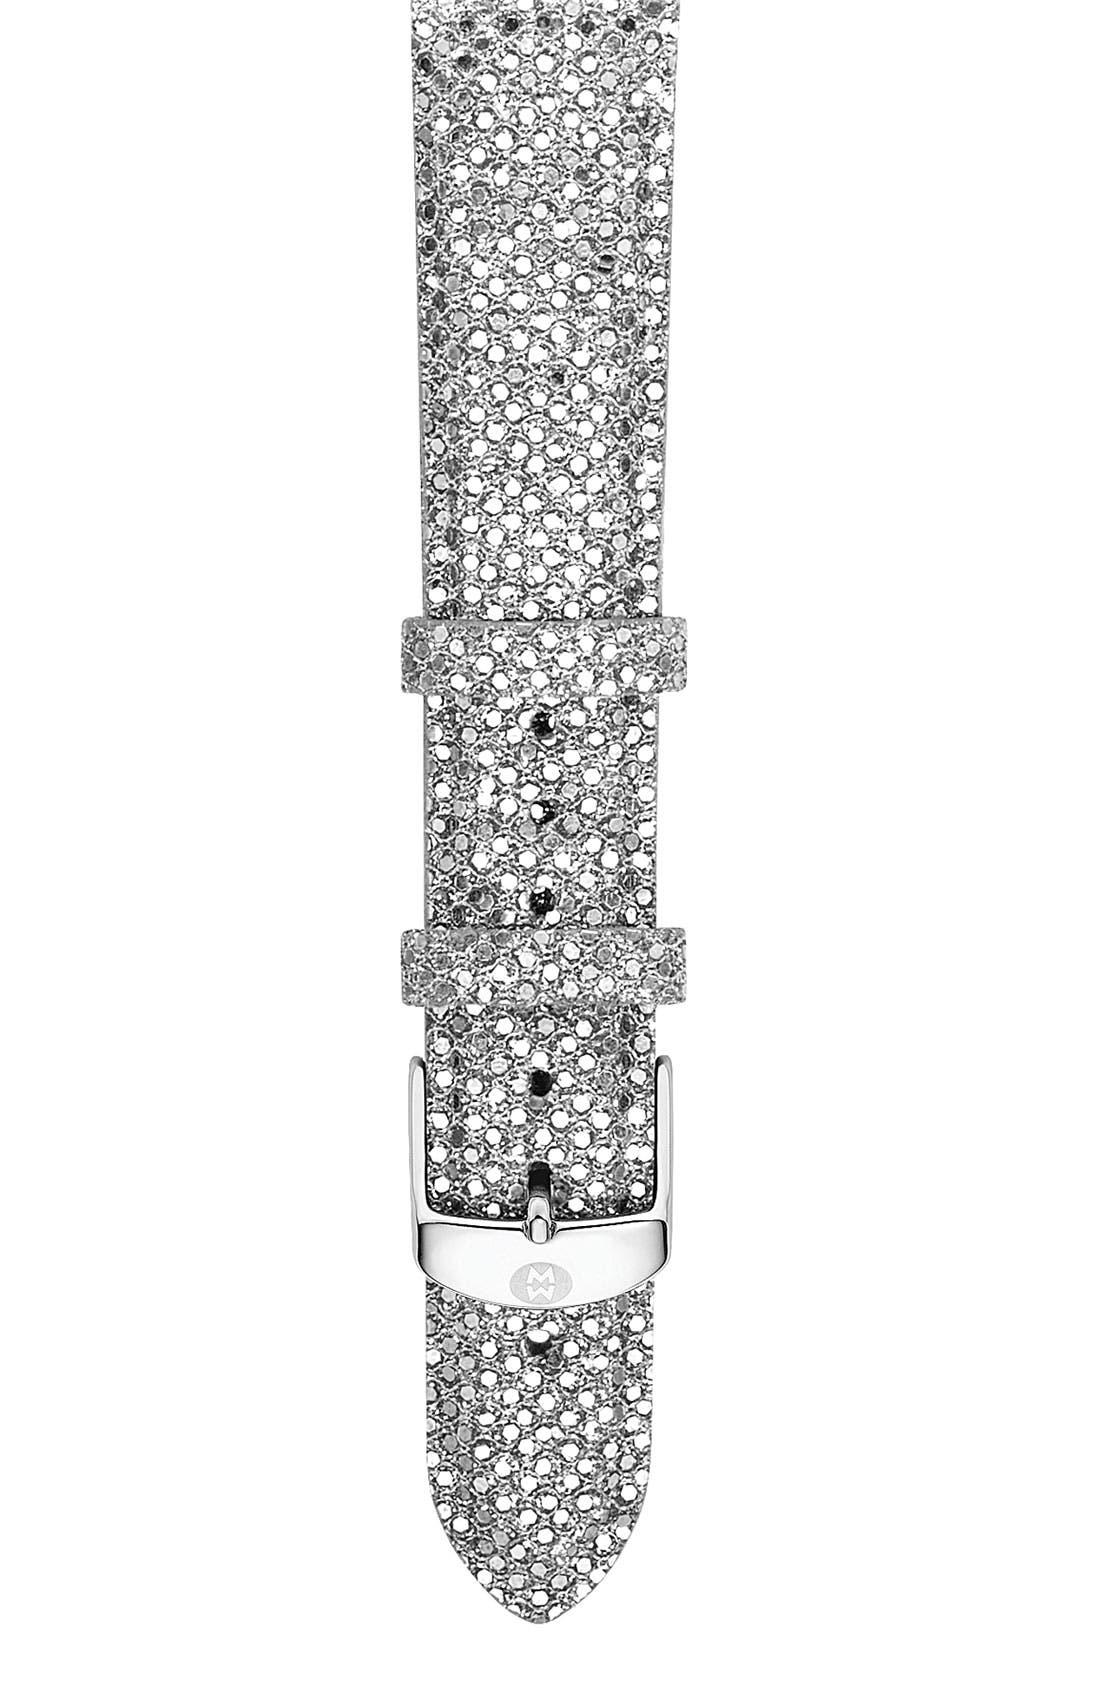 Alternate Image 1 Selected - MICHELE 'Deco 16 Diamond' Customizable Watch